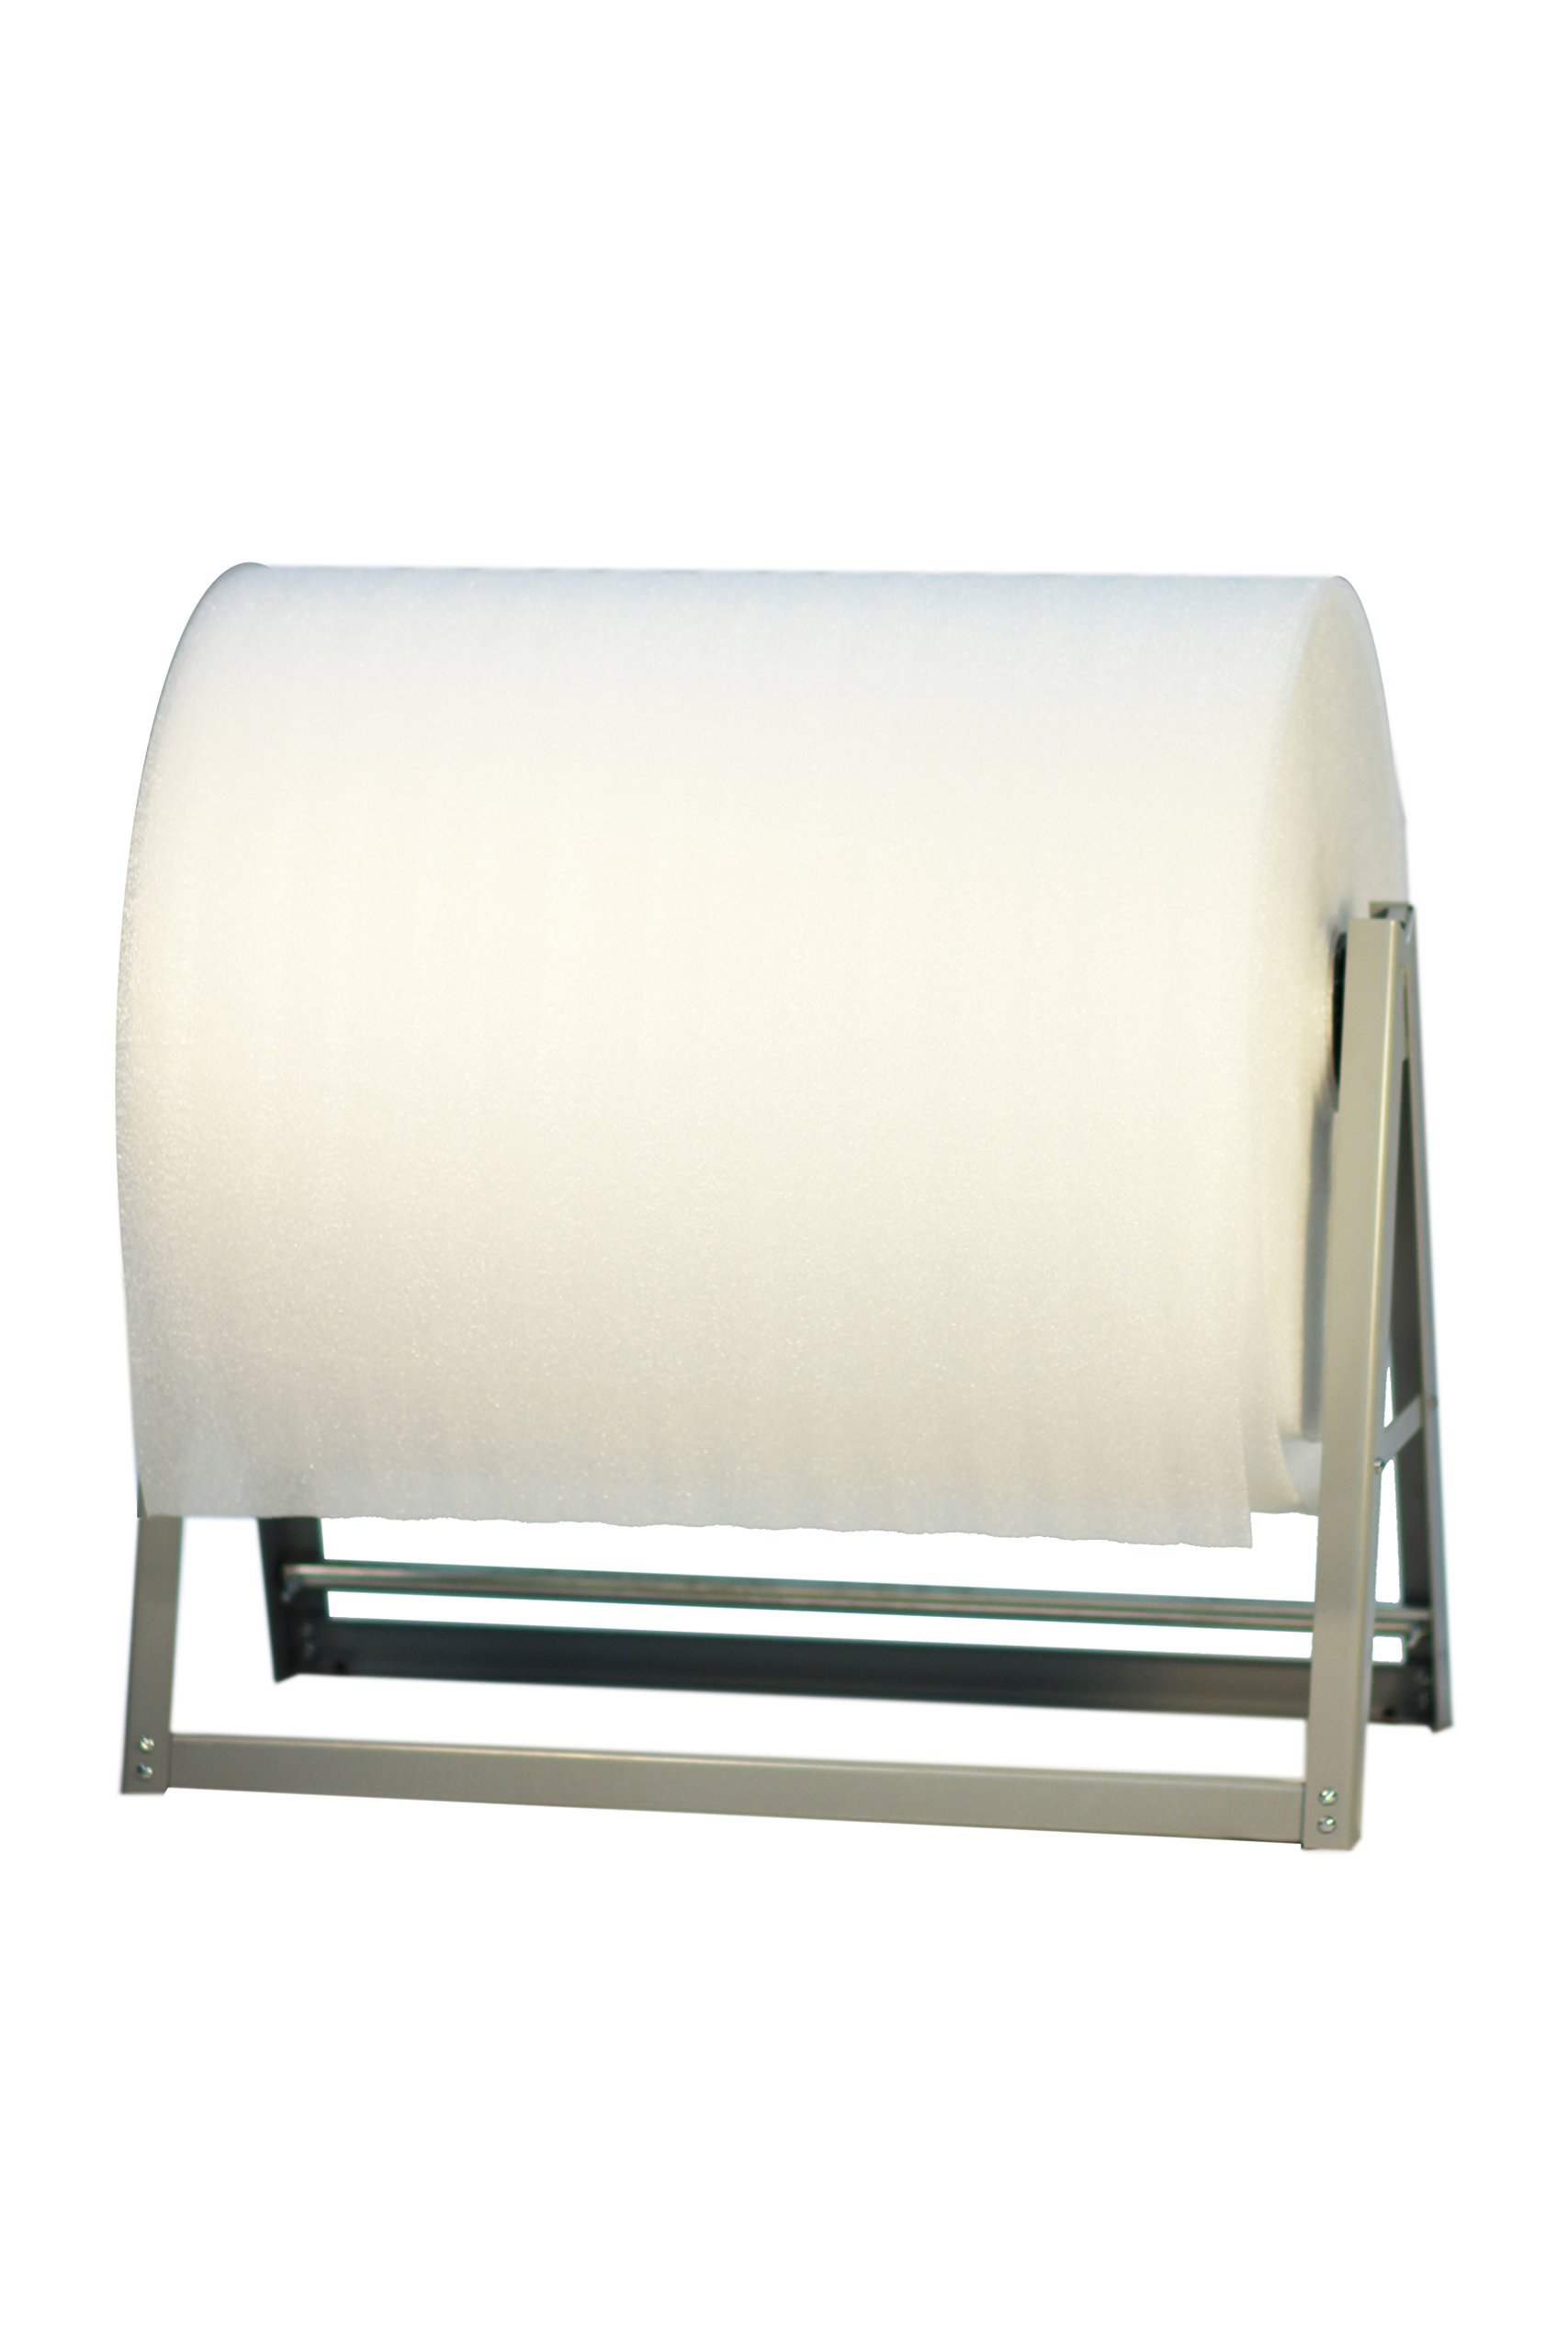 24'' Foam/ Bubble Cushion Wrap Dispenser Reel Holder - 40'' Diameter Roll - Bulman-M560-24 by Miller Supply Inc